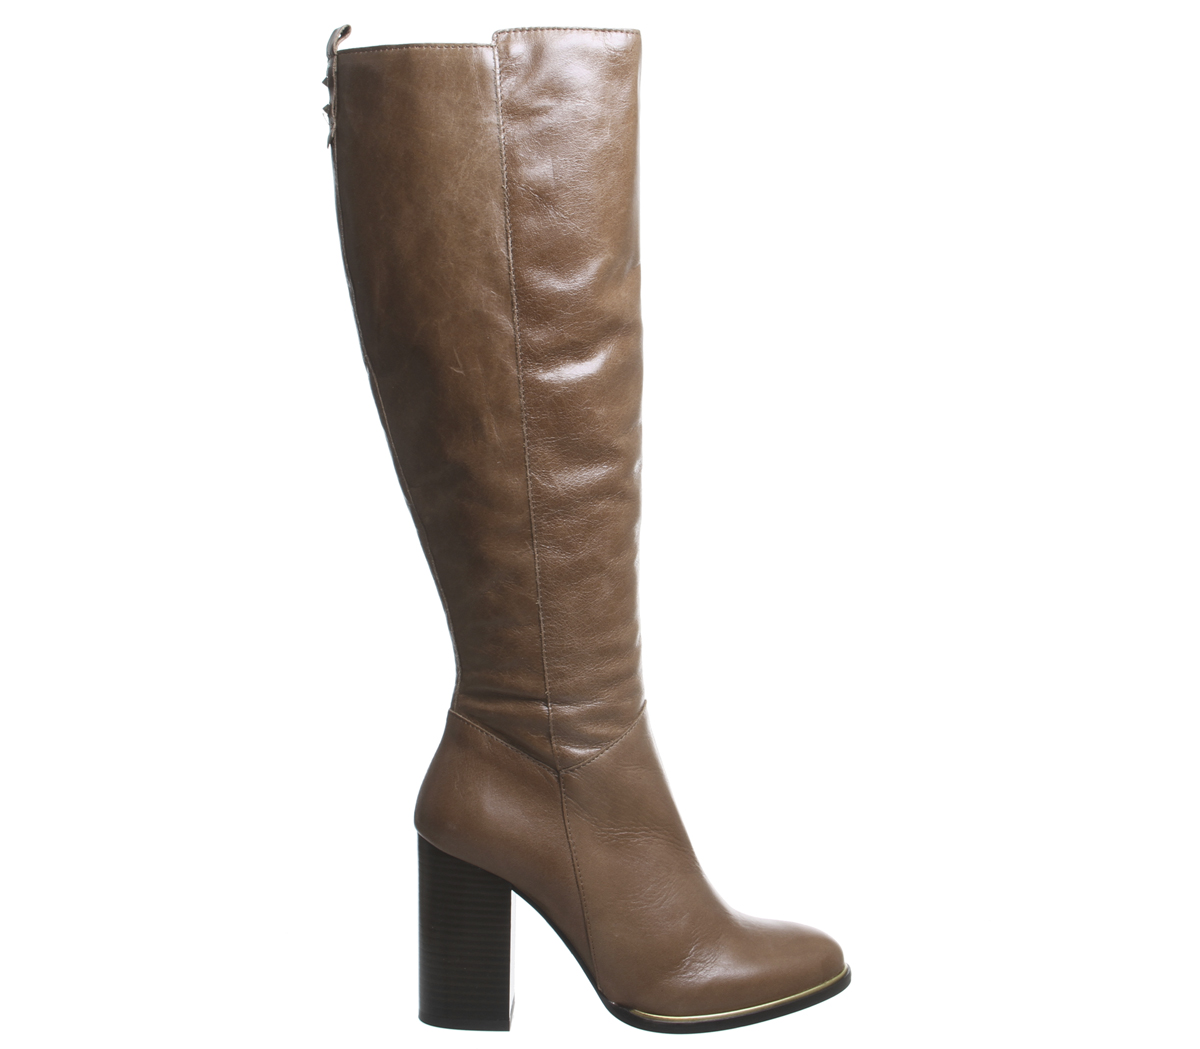 Womens Knee Office Kirby Smart Block Heel Knee Womens Boots TAN LEATHER Boots 19656c